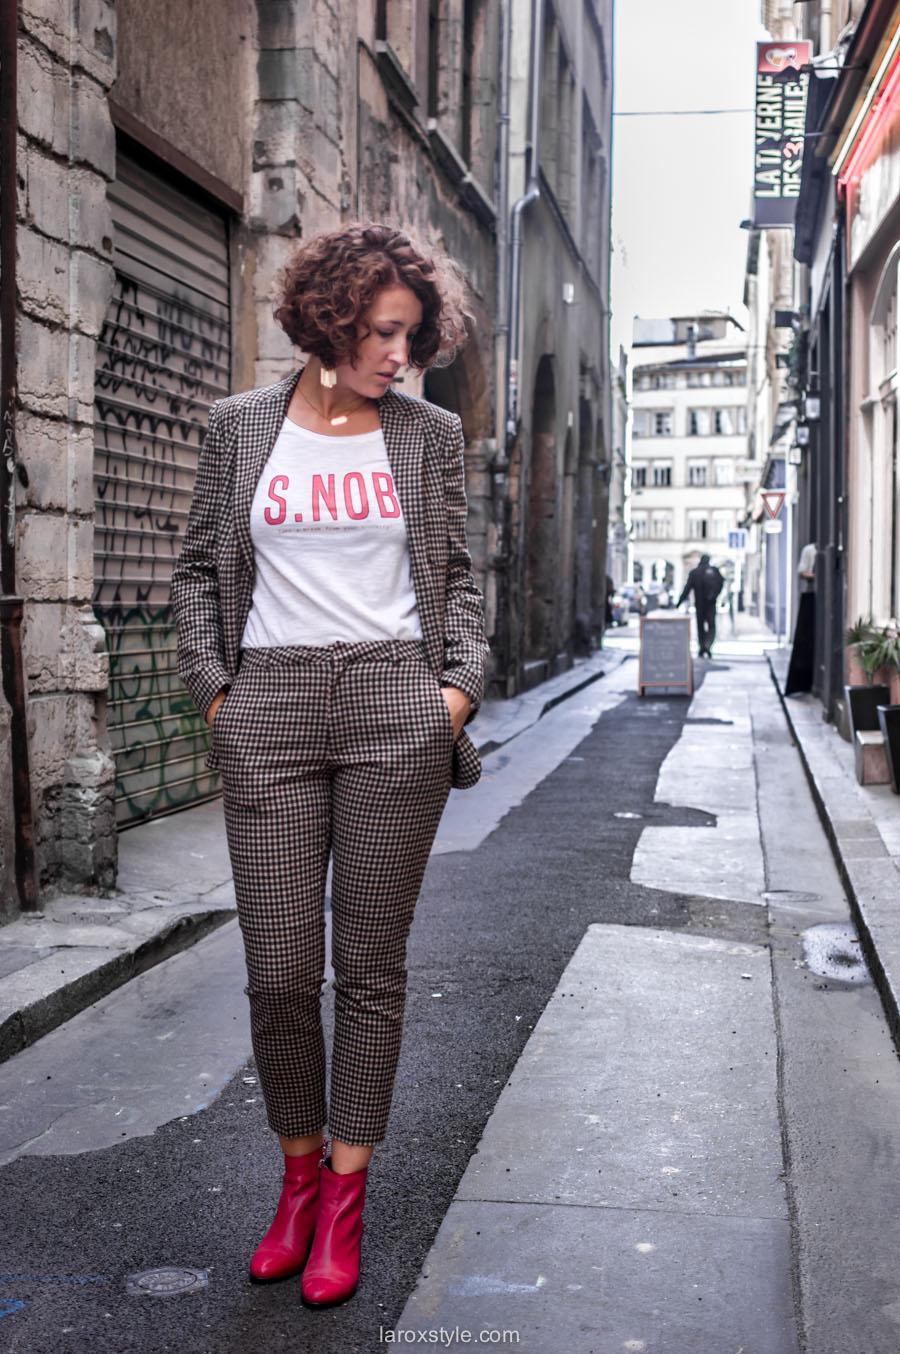 costume femme - tendance costume - t shirt message leonor roversi - SNOB - laroxstyle-1